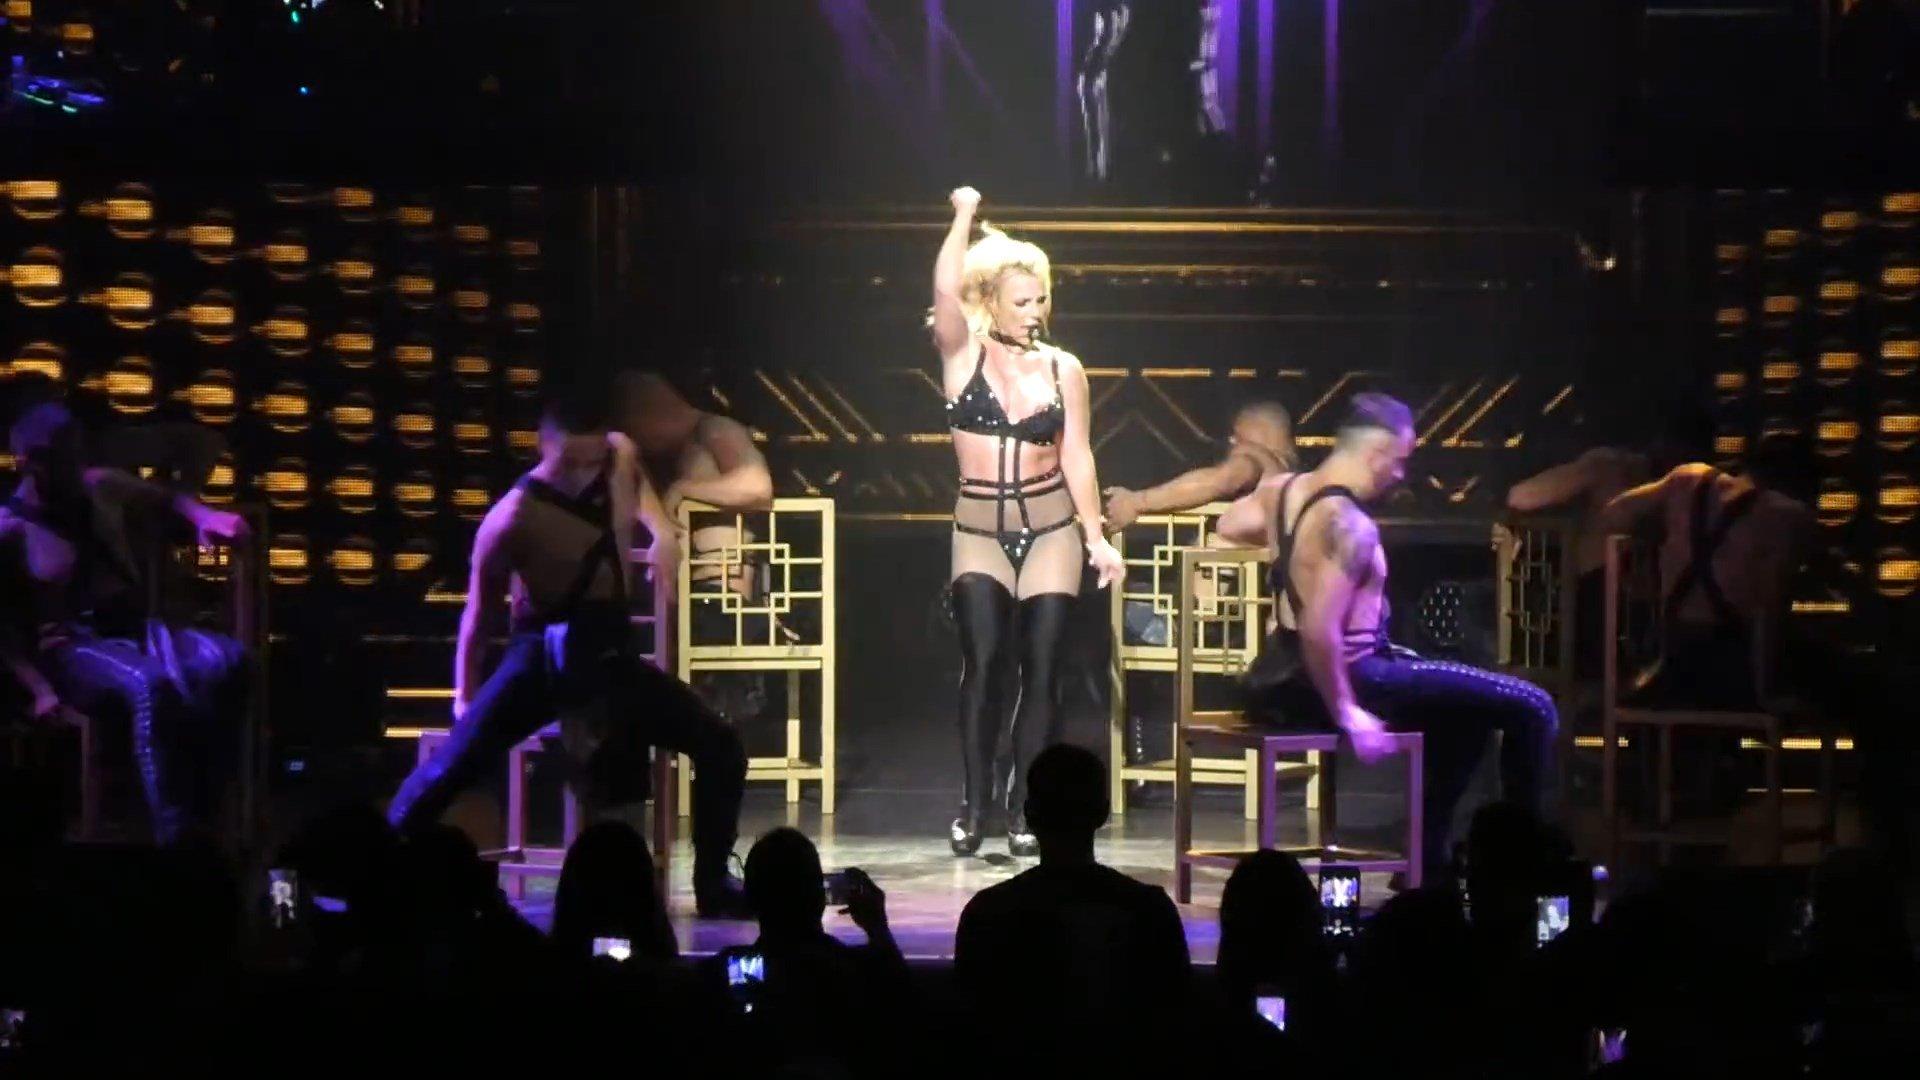 Britney-Spears-Nip-Slip-5-thefappeningblog.com_.jpg